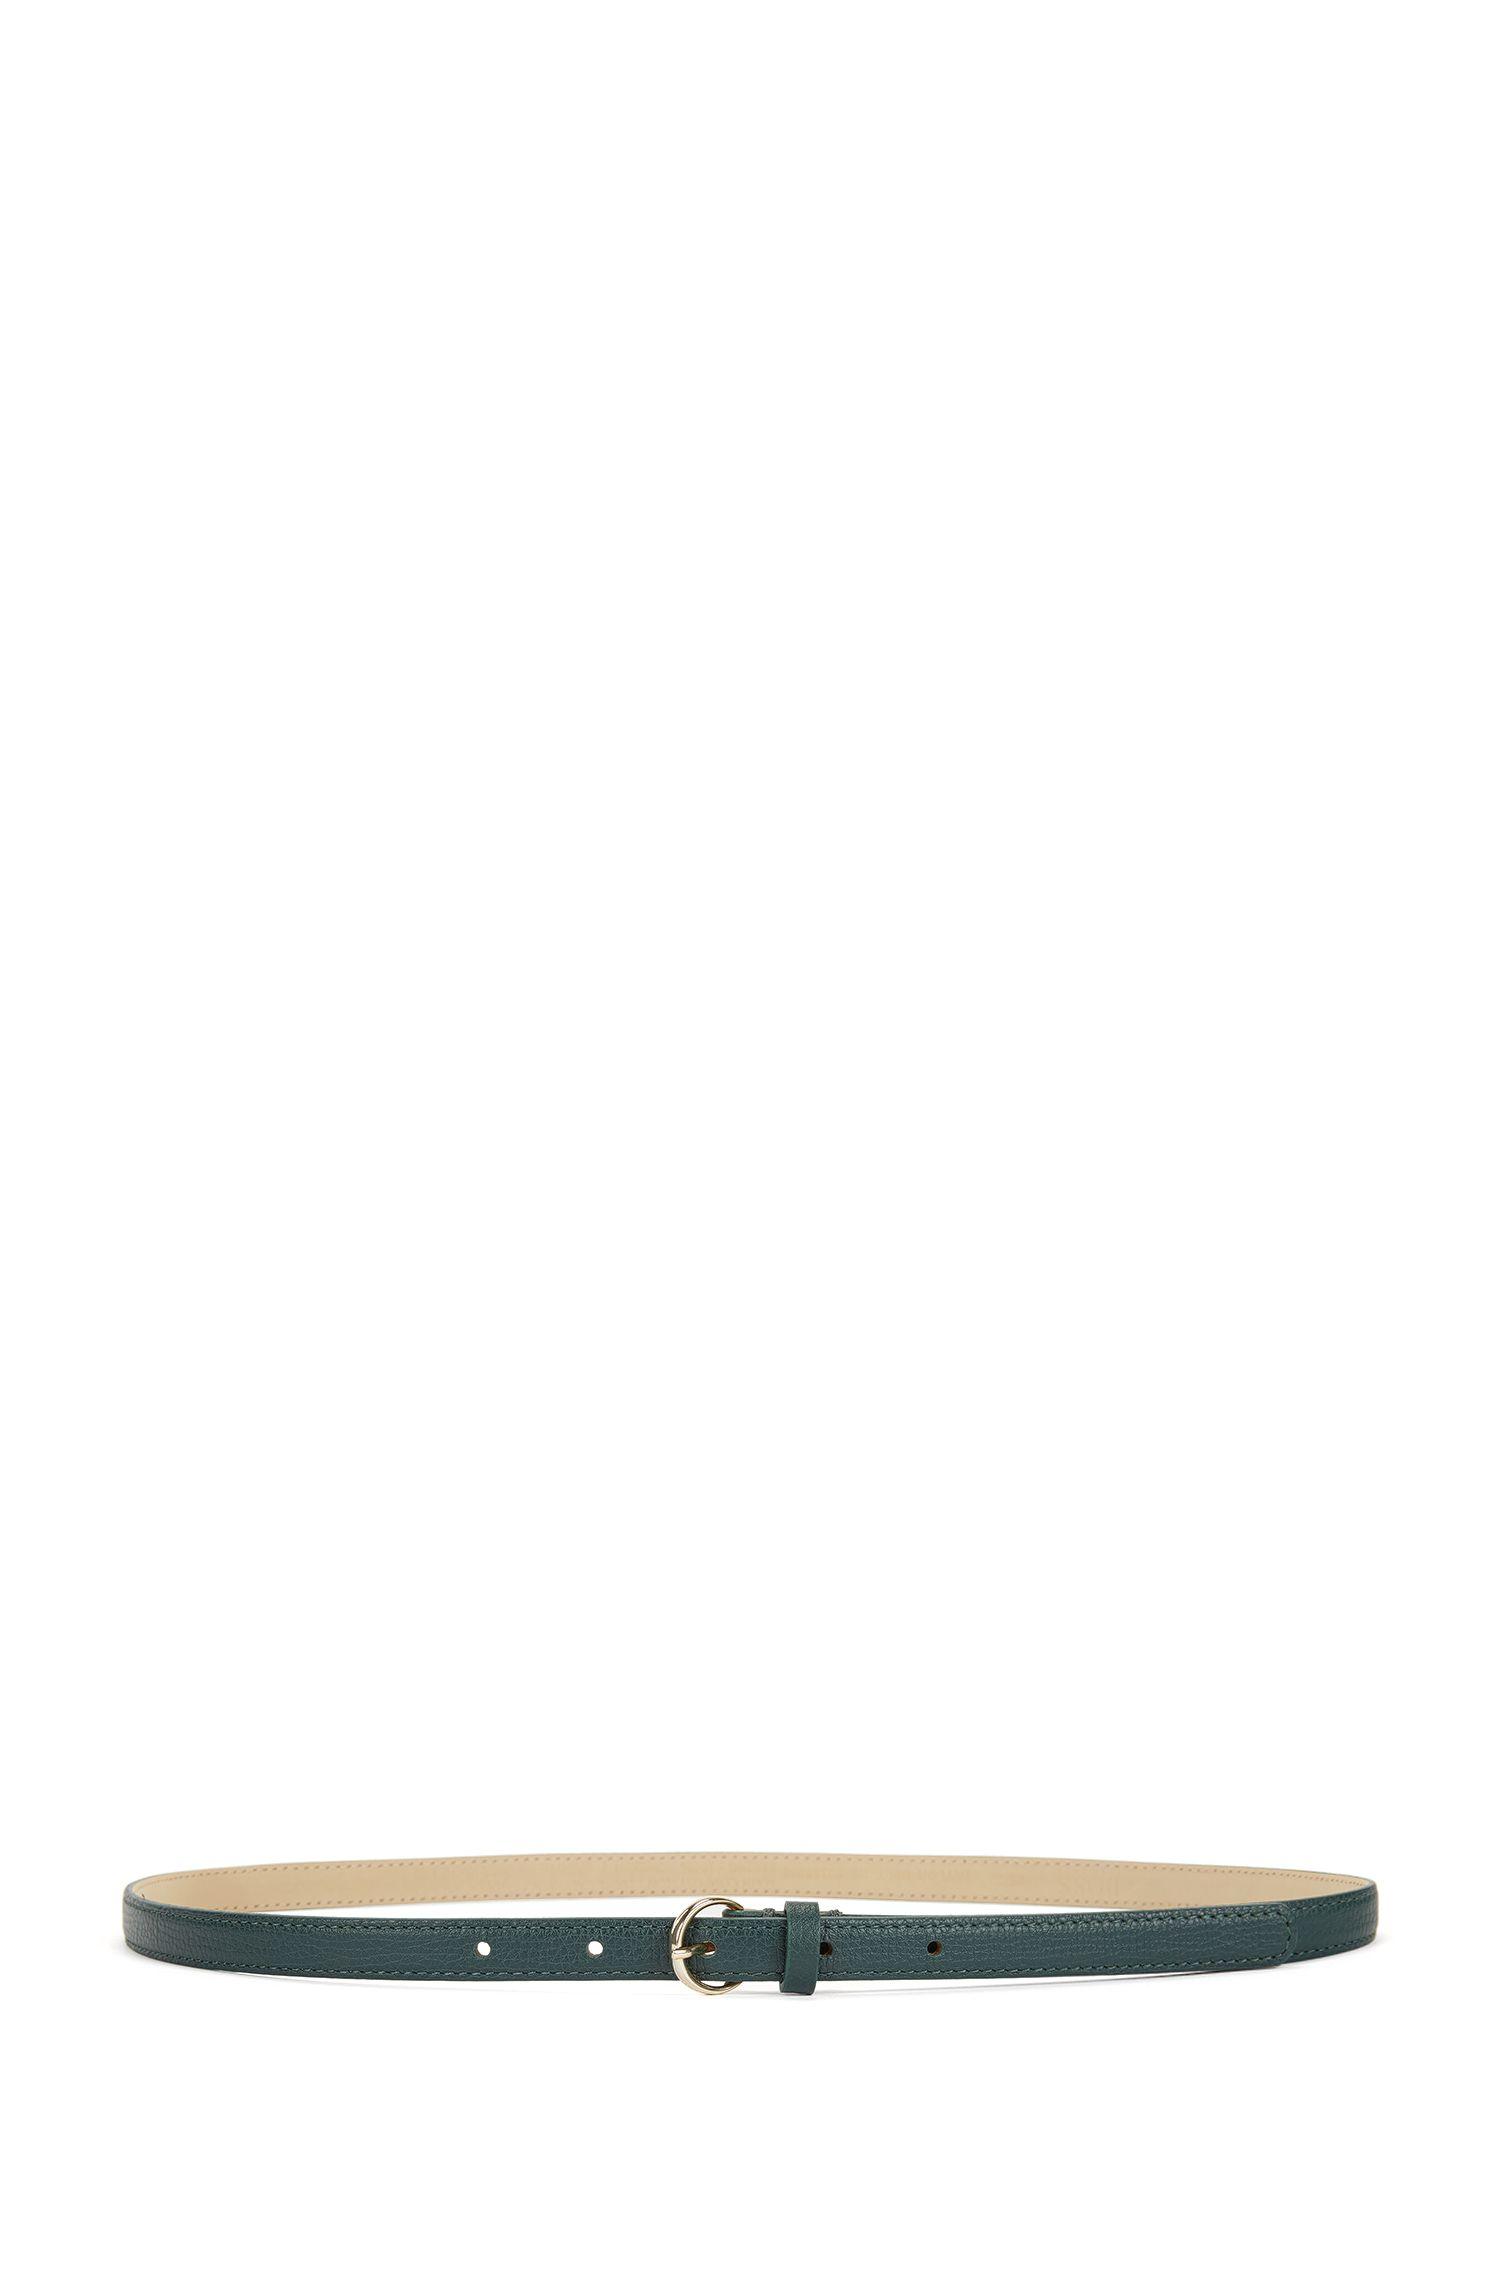 Schmaler Gürtel aus genarbtem italienischem Leder